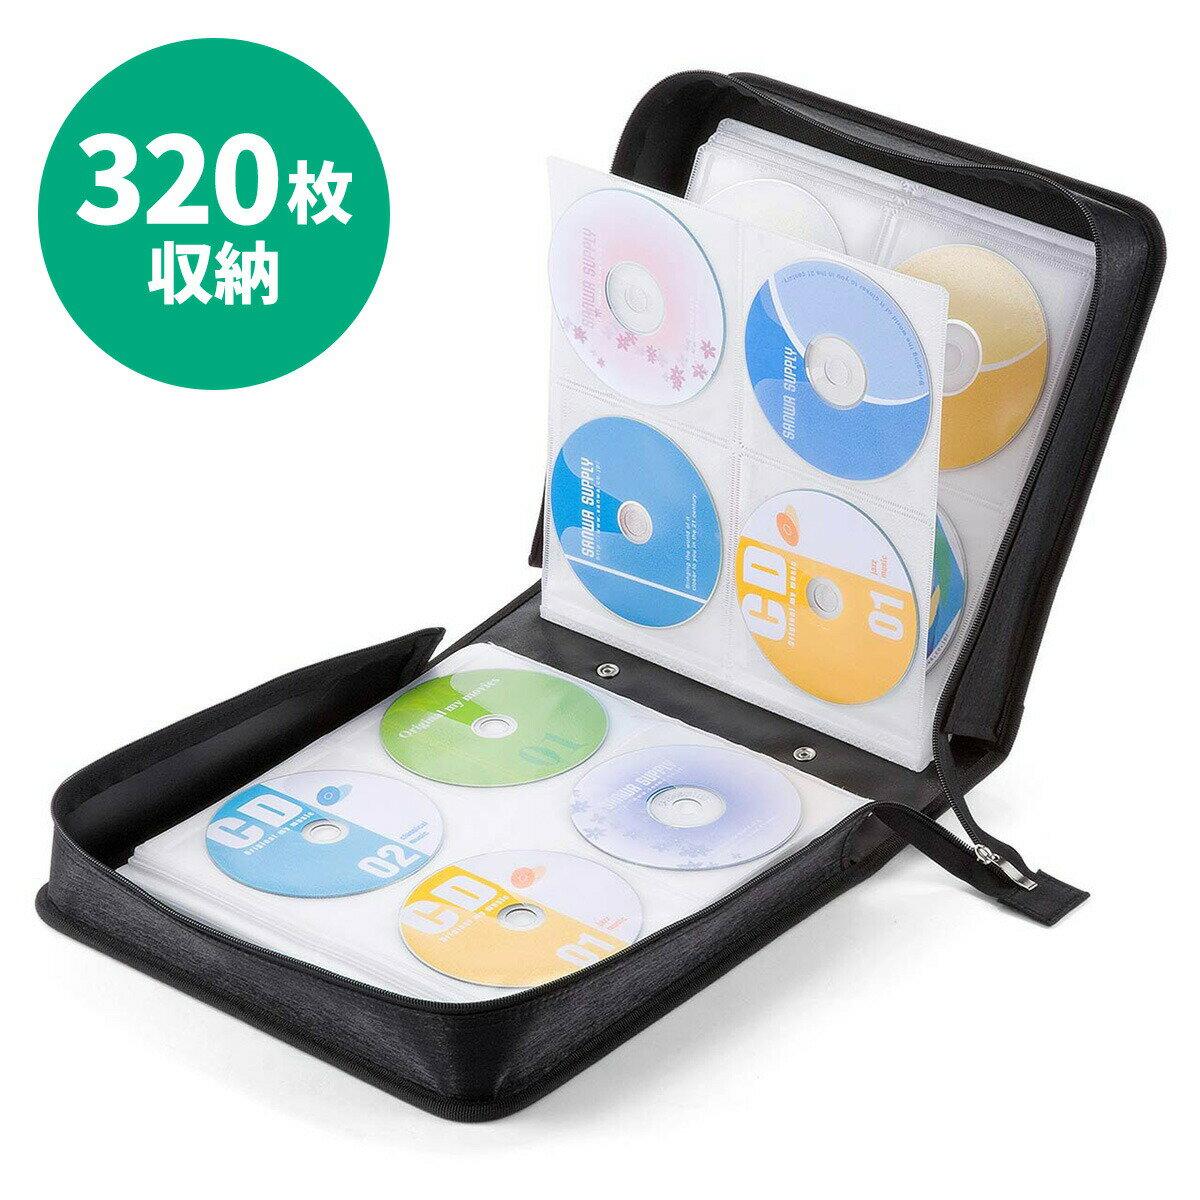 CDケース DVDケース キャリングケース 320枚収納 ファイル型 収納ケース メディアケース 持ち運び [200-FCD030]【サンワダイレクト限定品】